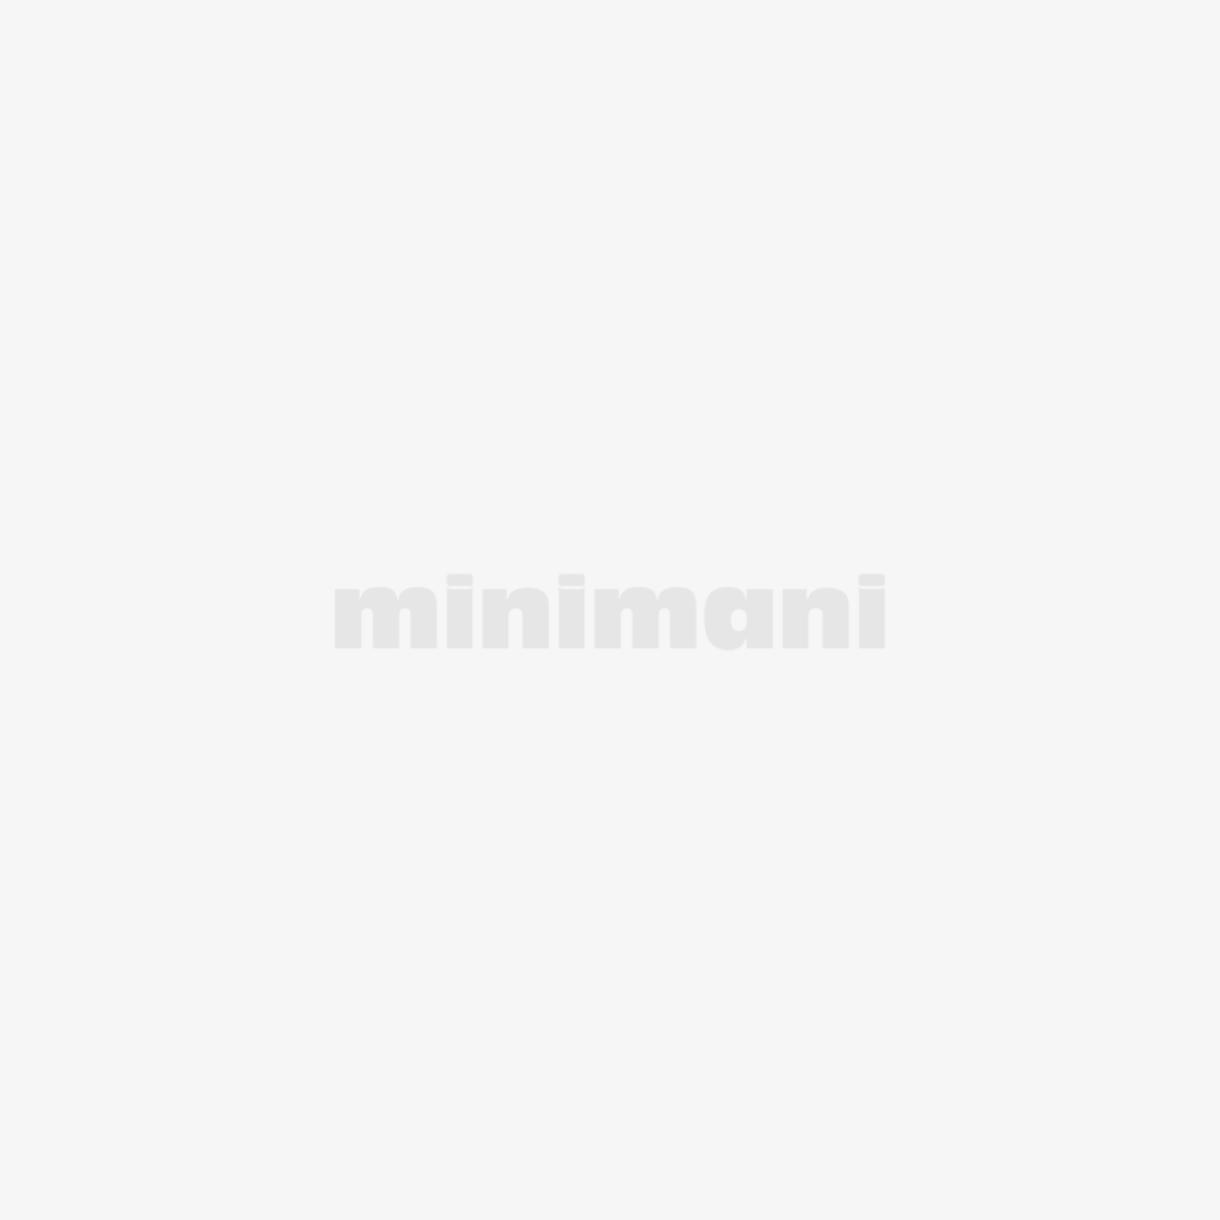 M-FILTER RAITISILMASUODATIN MAC 8030 JUMPER, DUCATO, BOXER